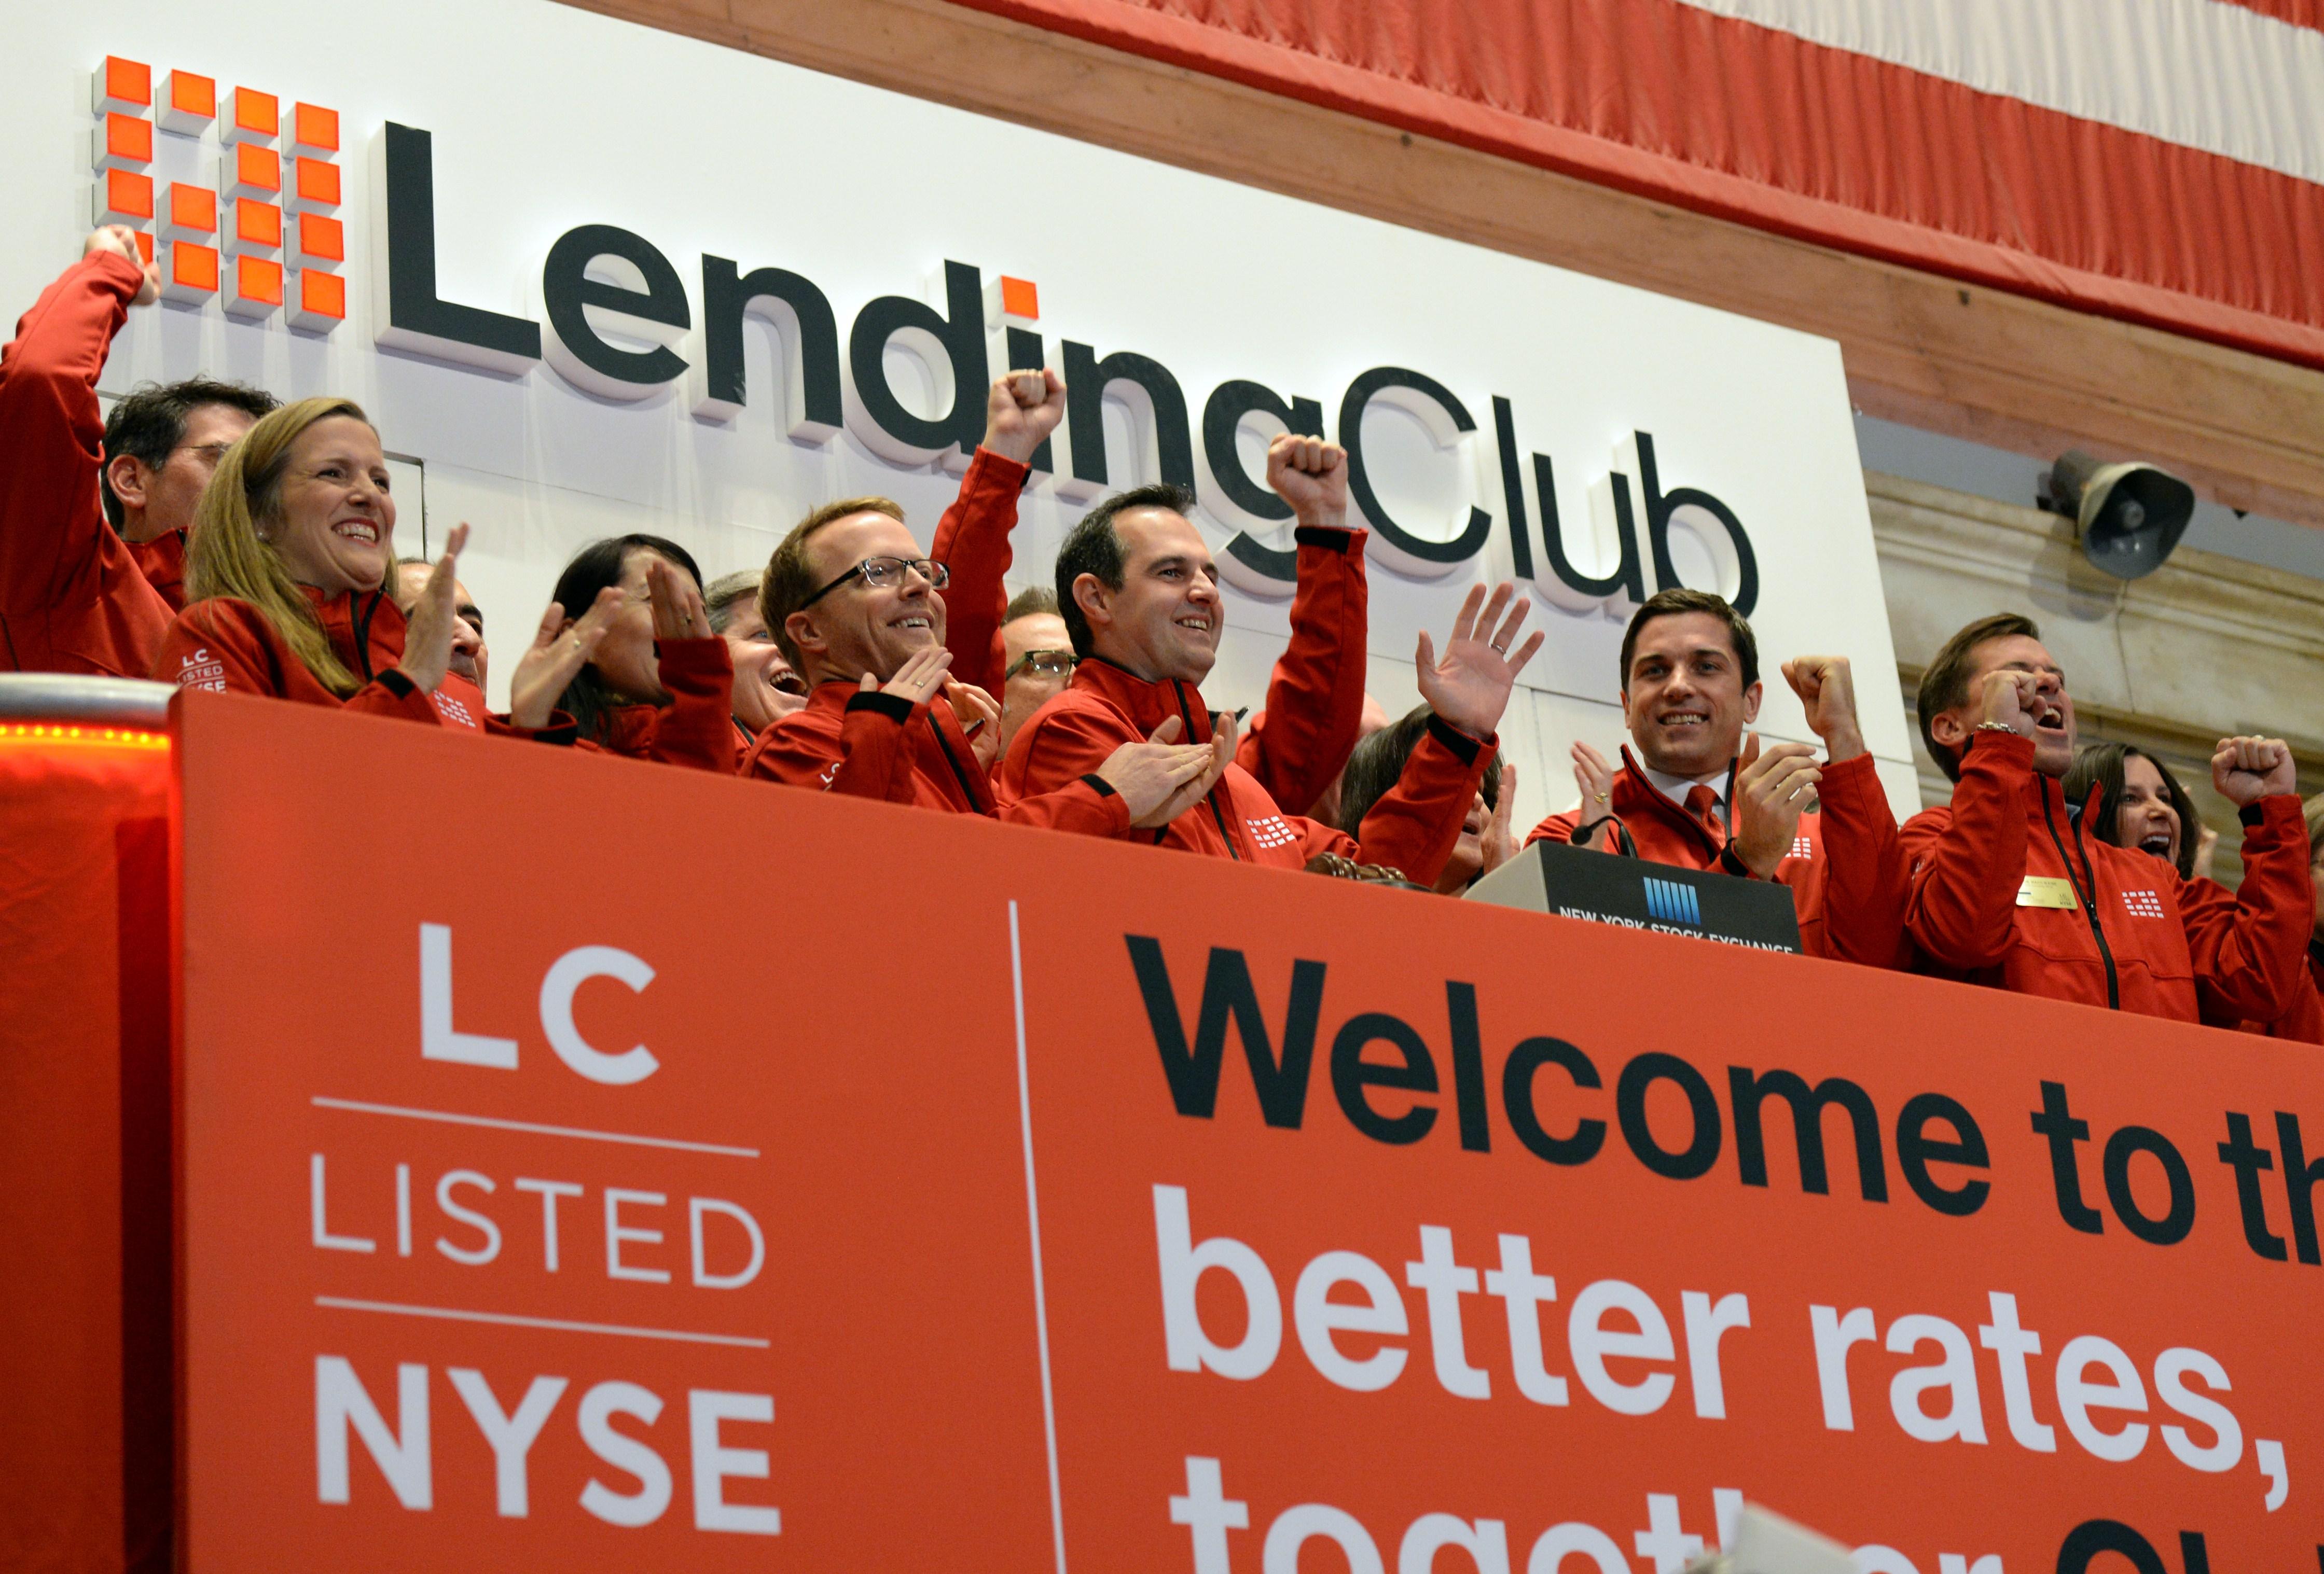 US-ECONOMY-LENDING CLUB